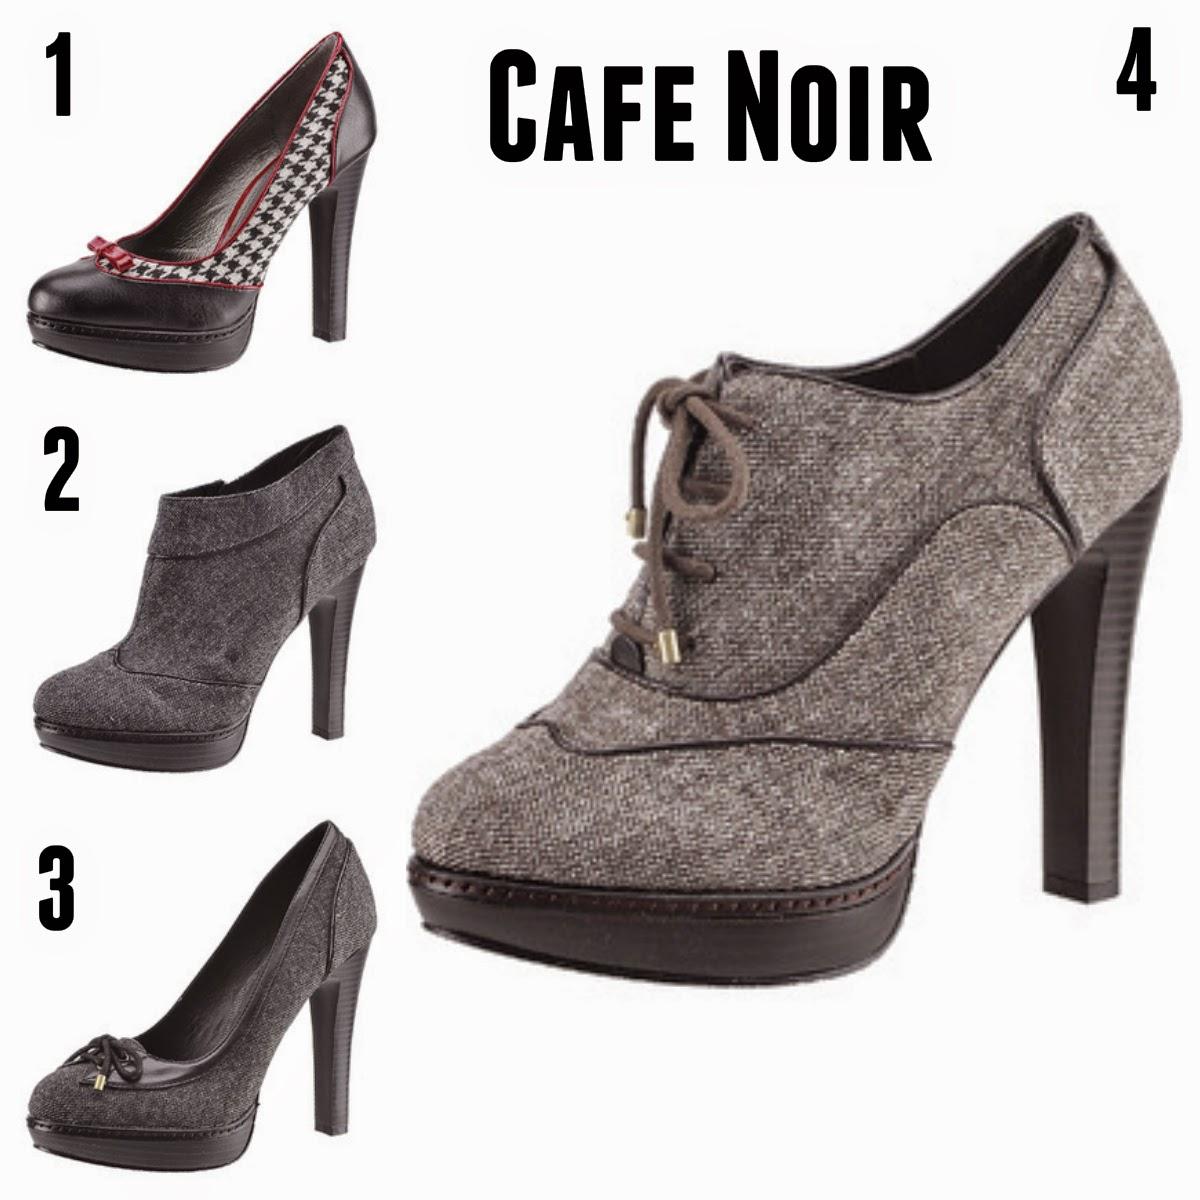 clarks, cafe noir, buffalo londyn